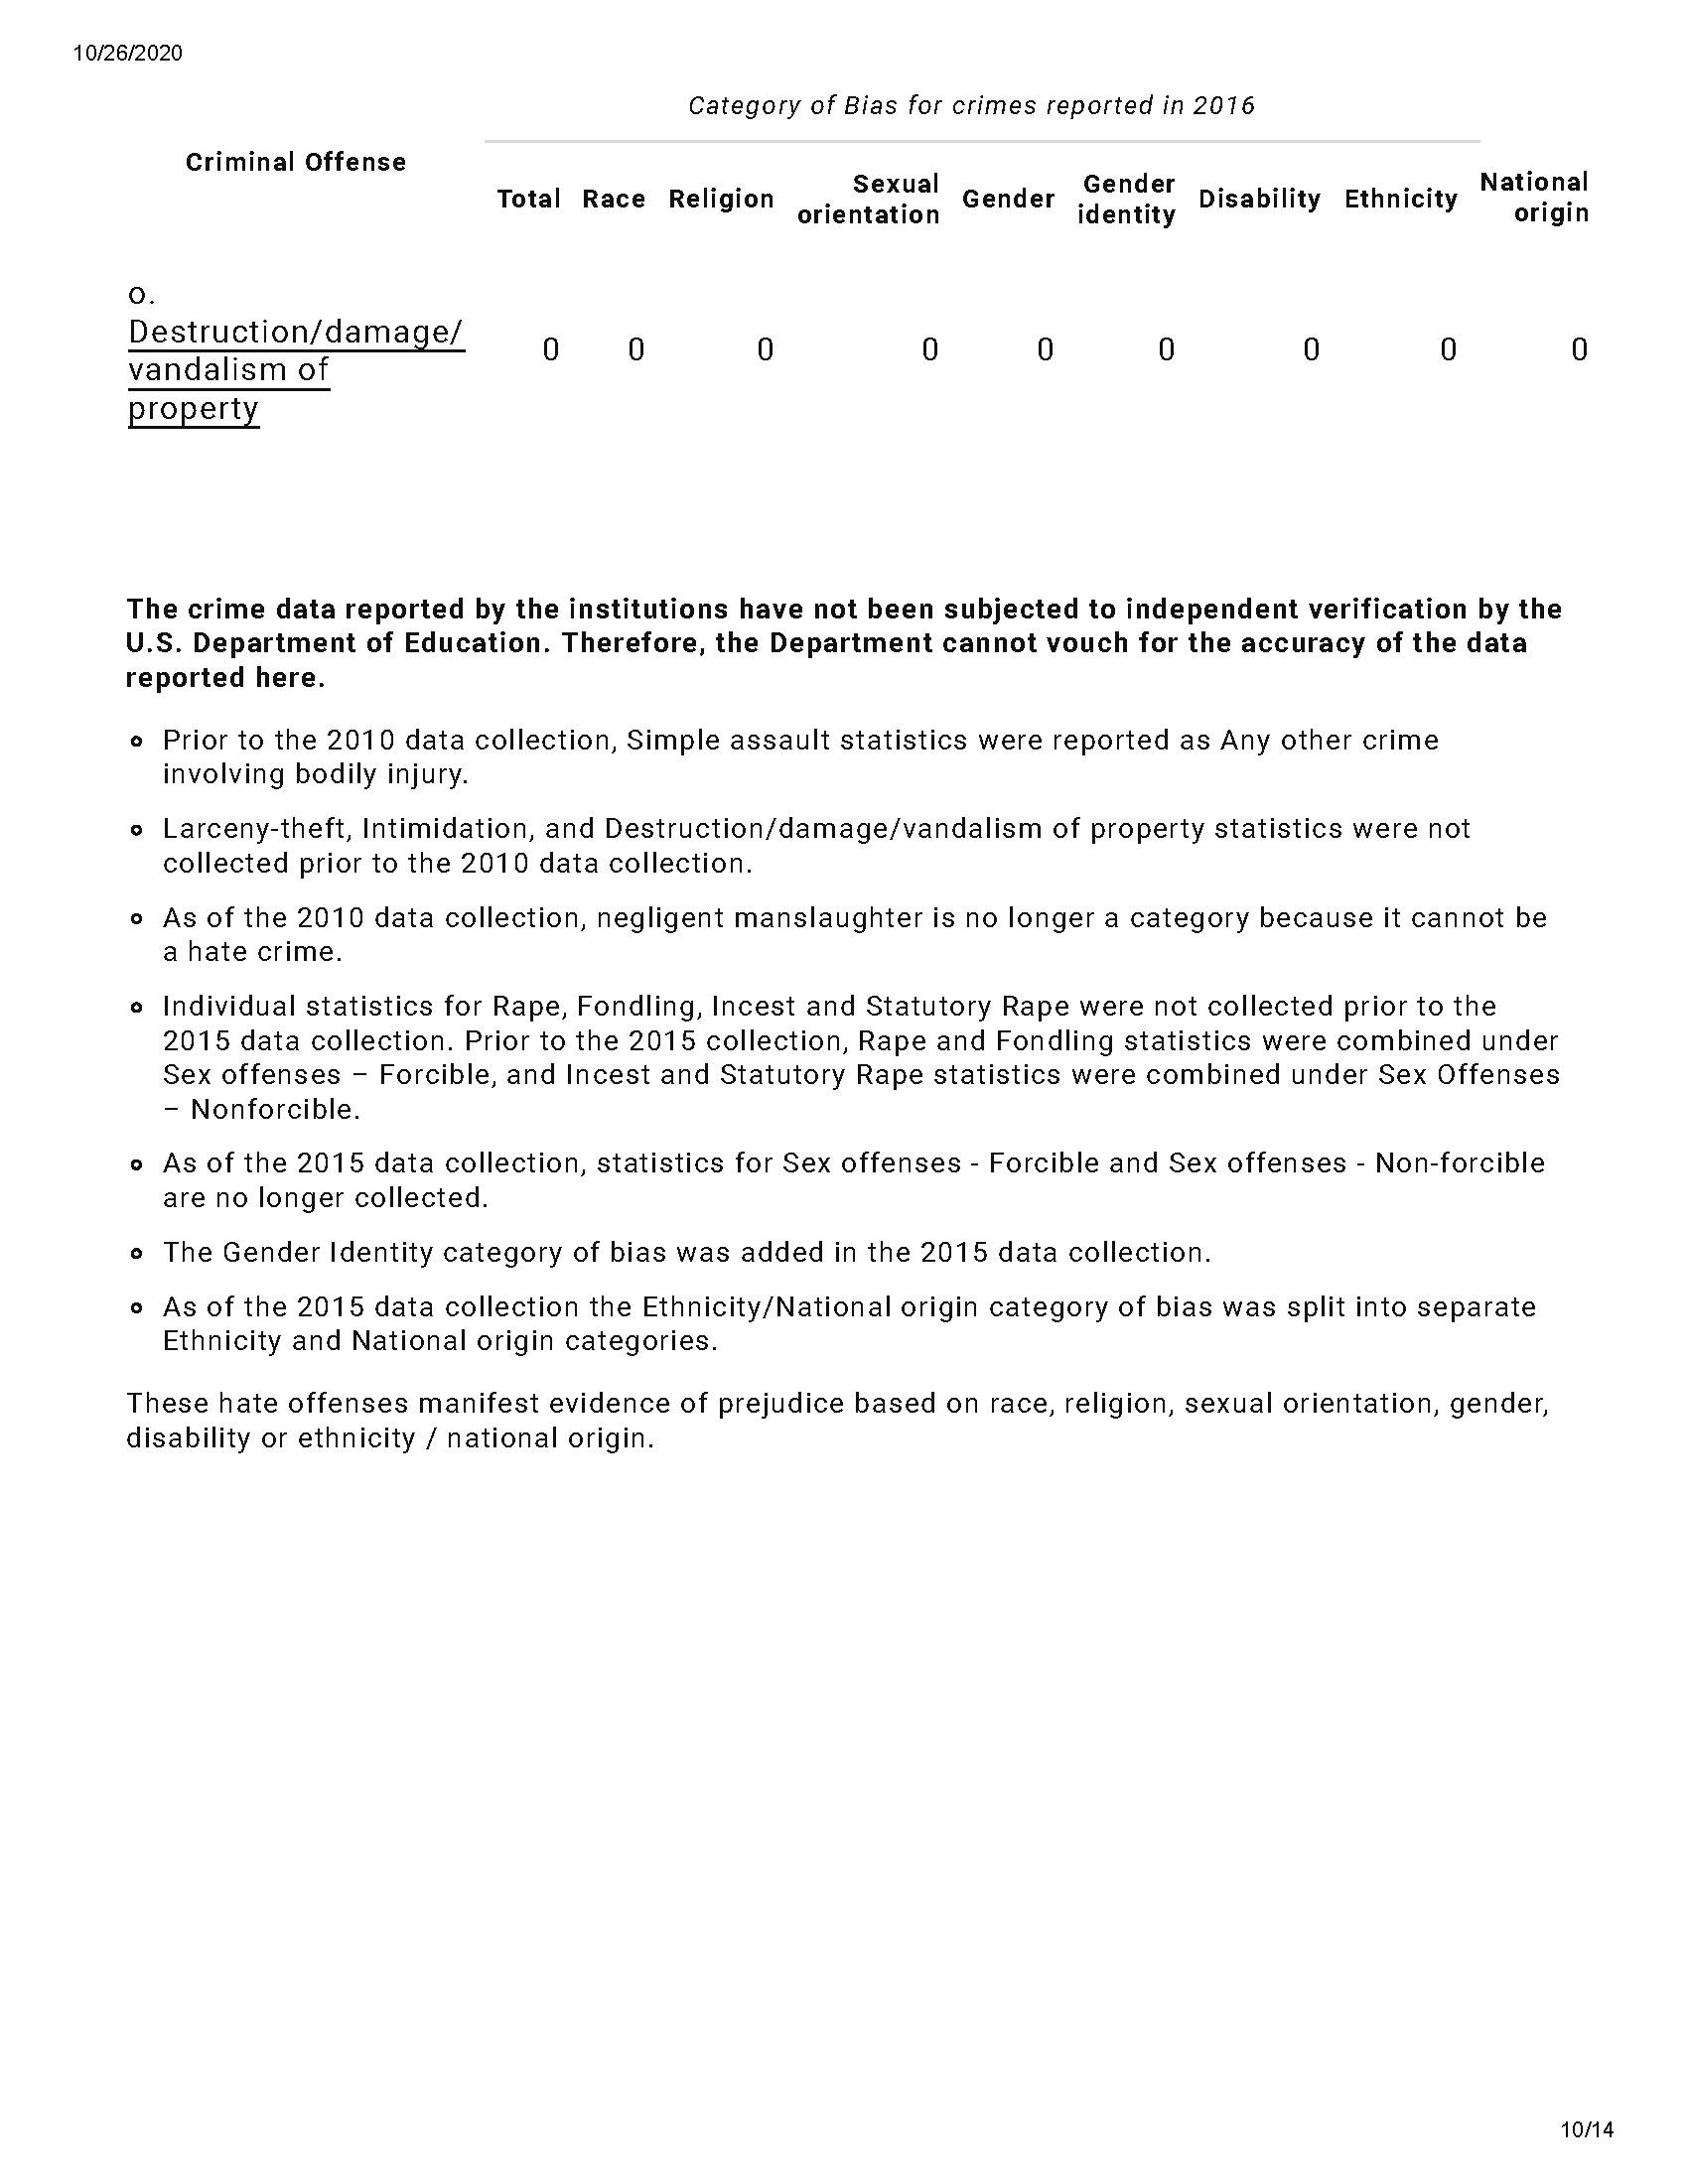 Lakewood crime statistics saved 10 2020 Page 10